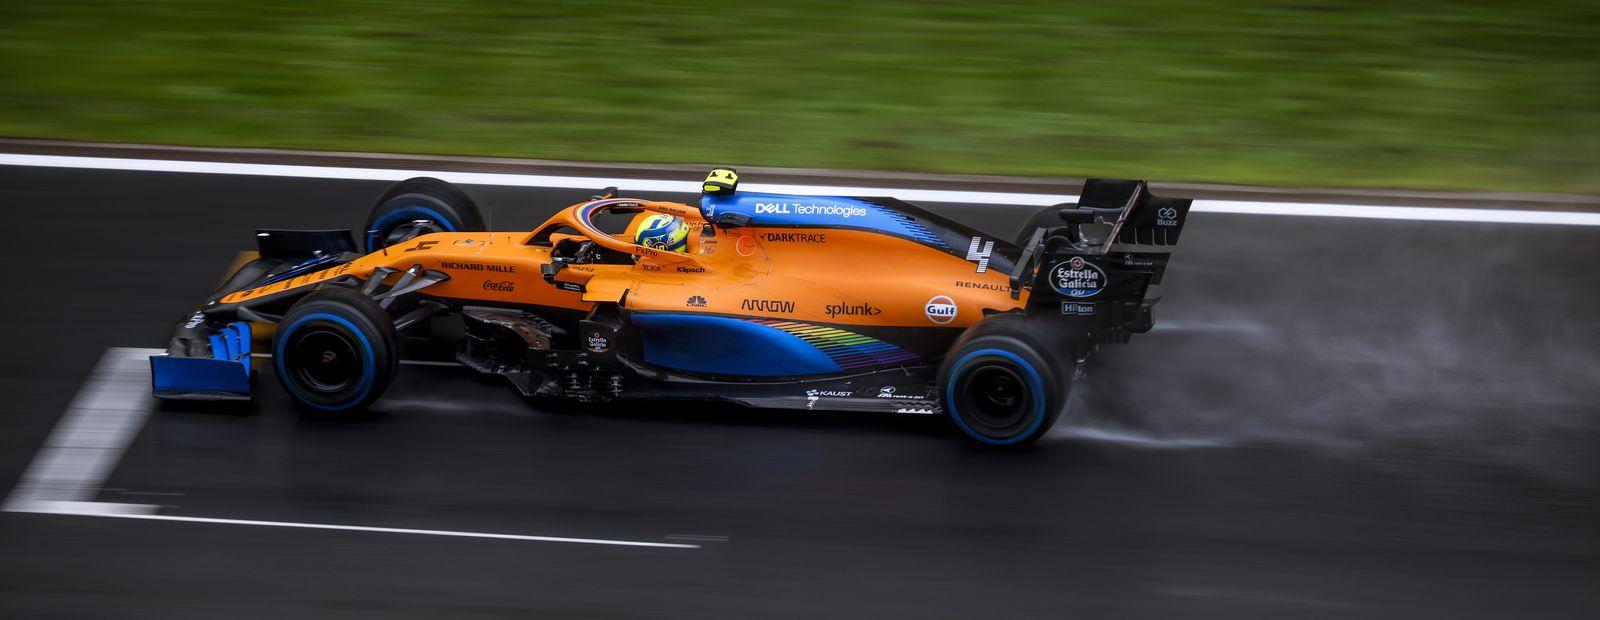 McLaren Racing announces multi-year partnership extension with Arrow Electronics